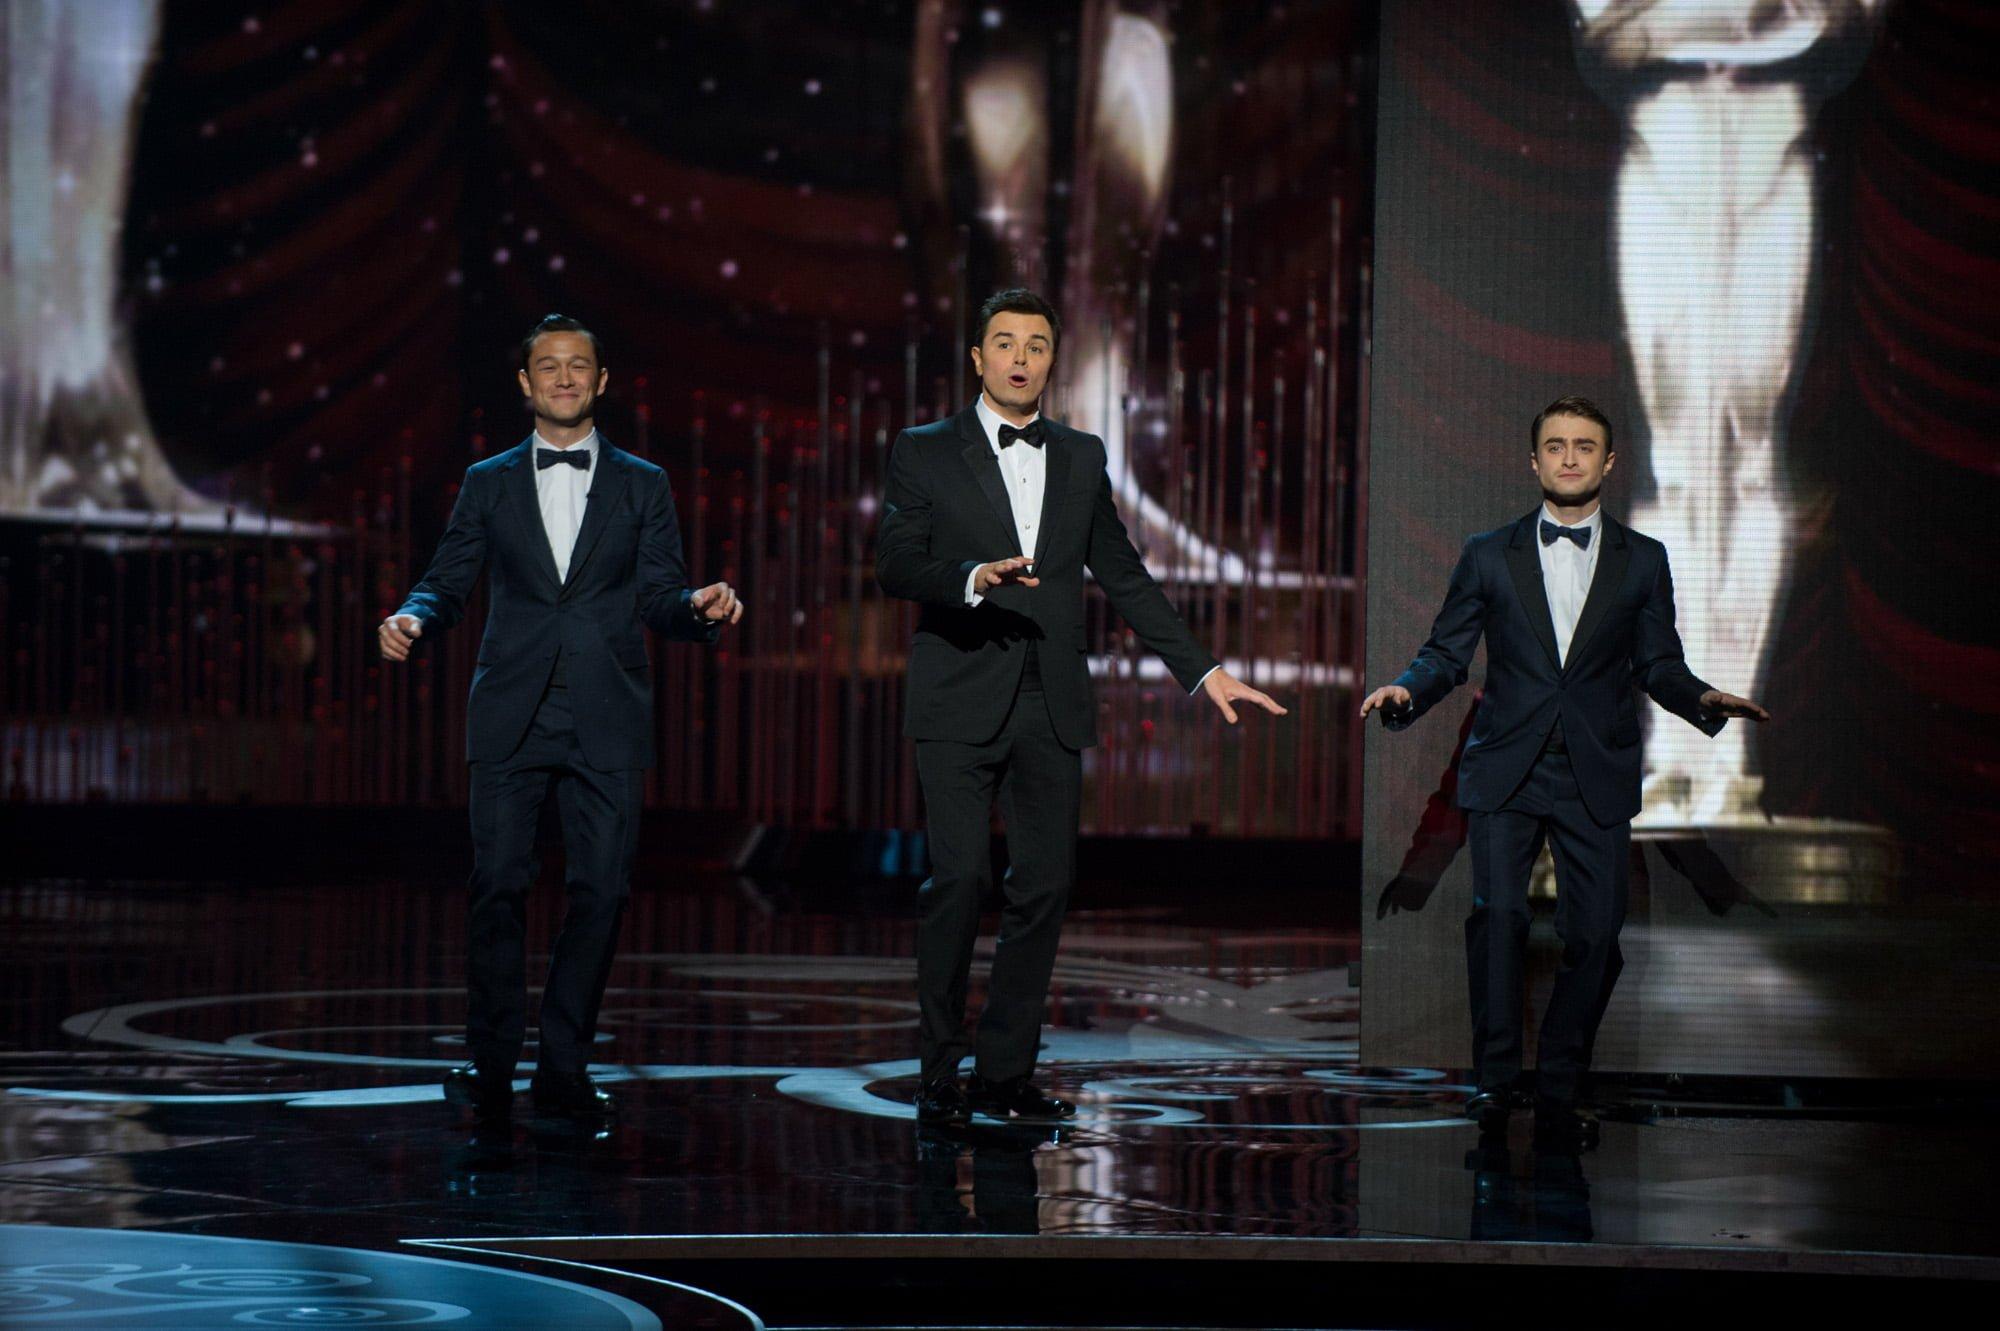 Joseph Gordon Levitt, Seth MacFarlane and Daniel Radcliffe